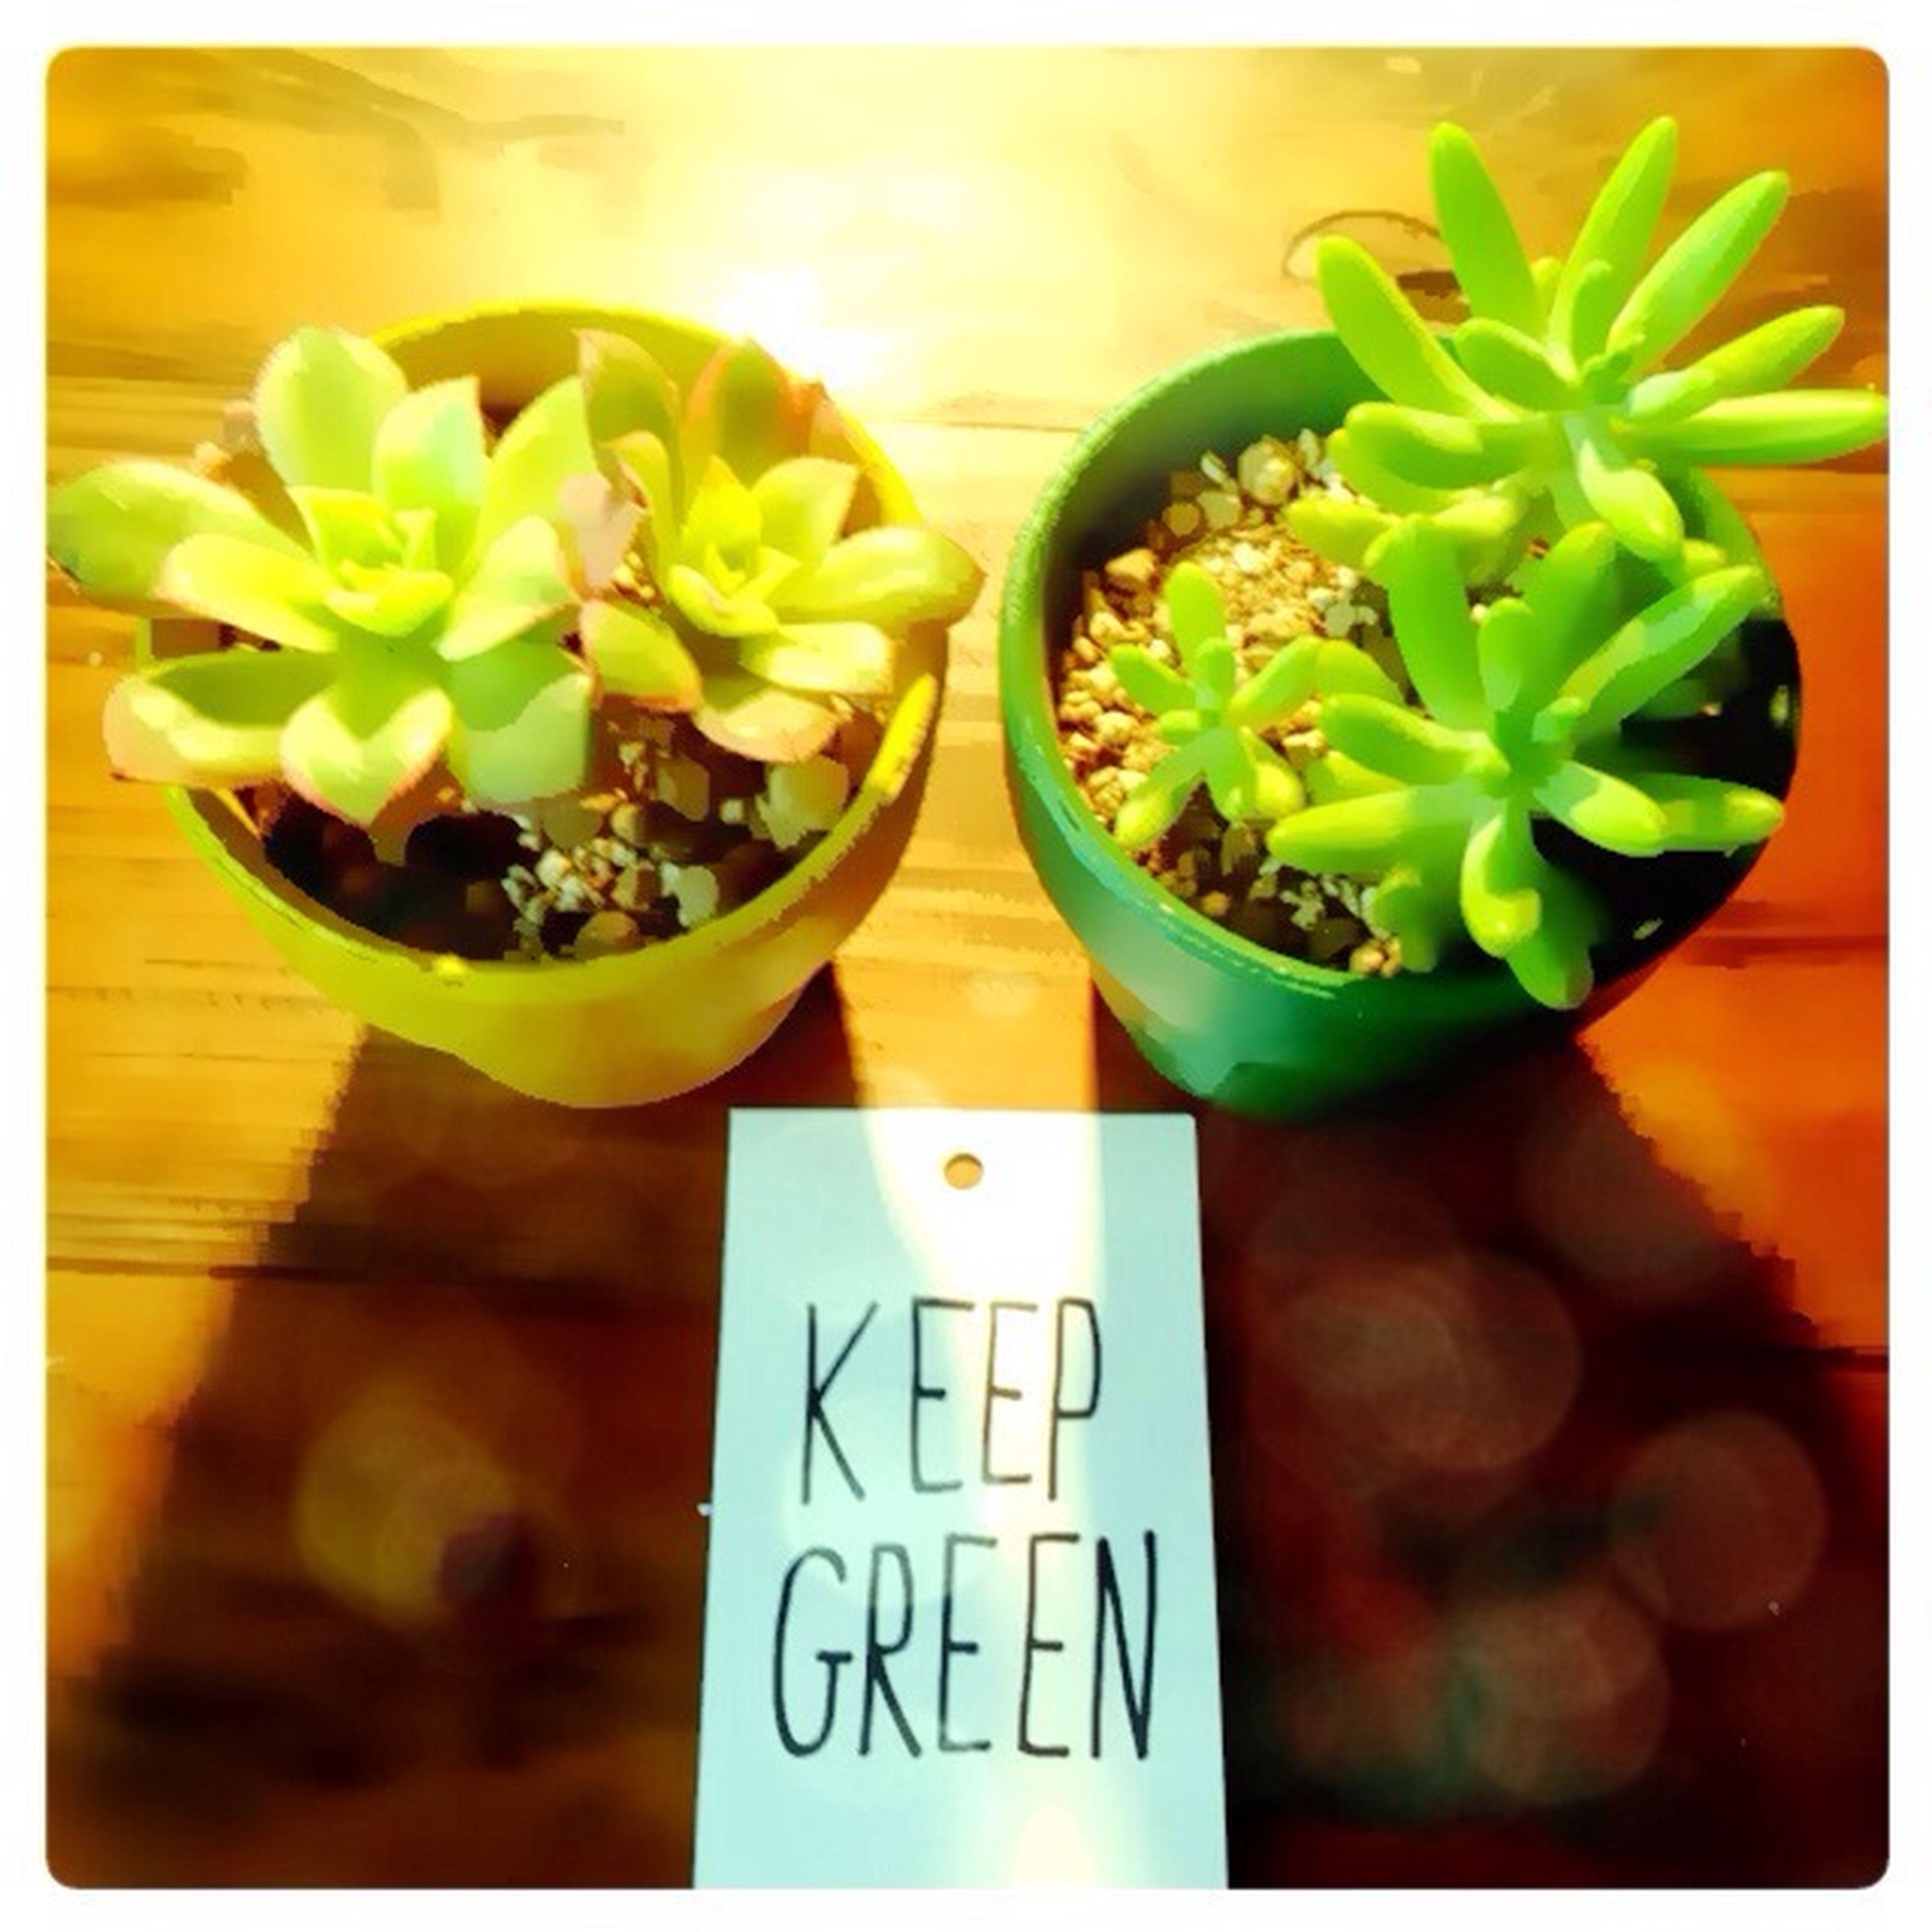 Enjoying Life new Plant ✰ So Cute (OvO)